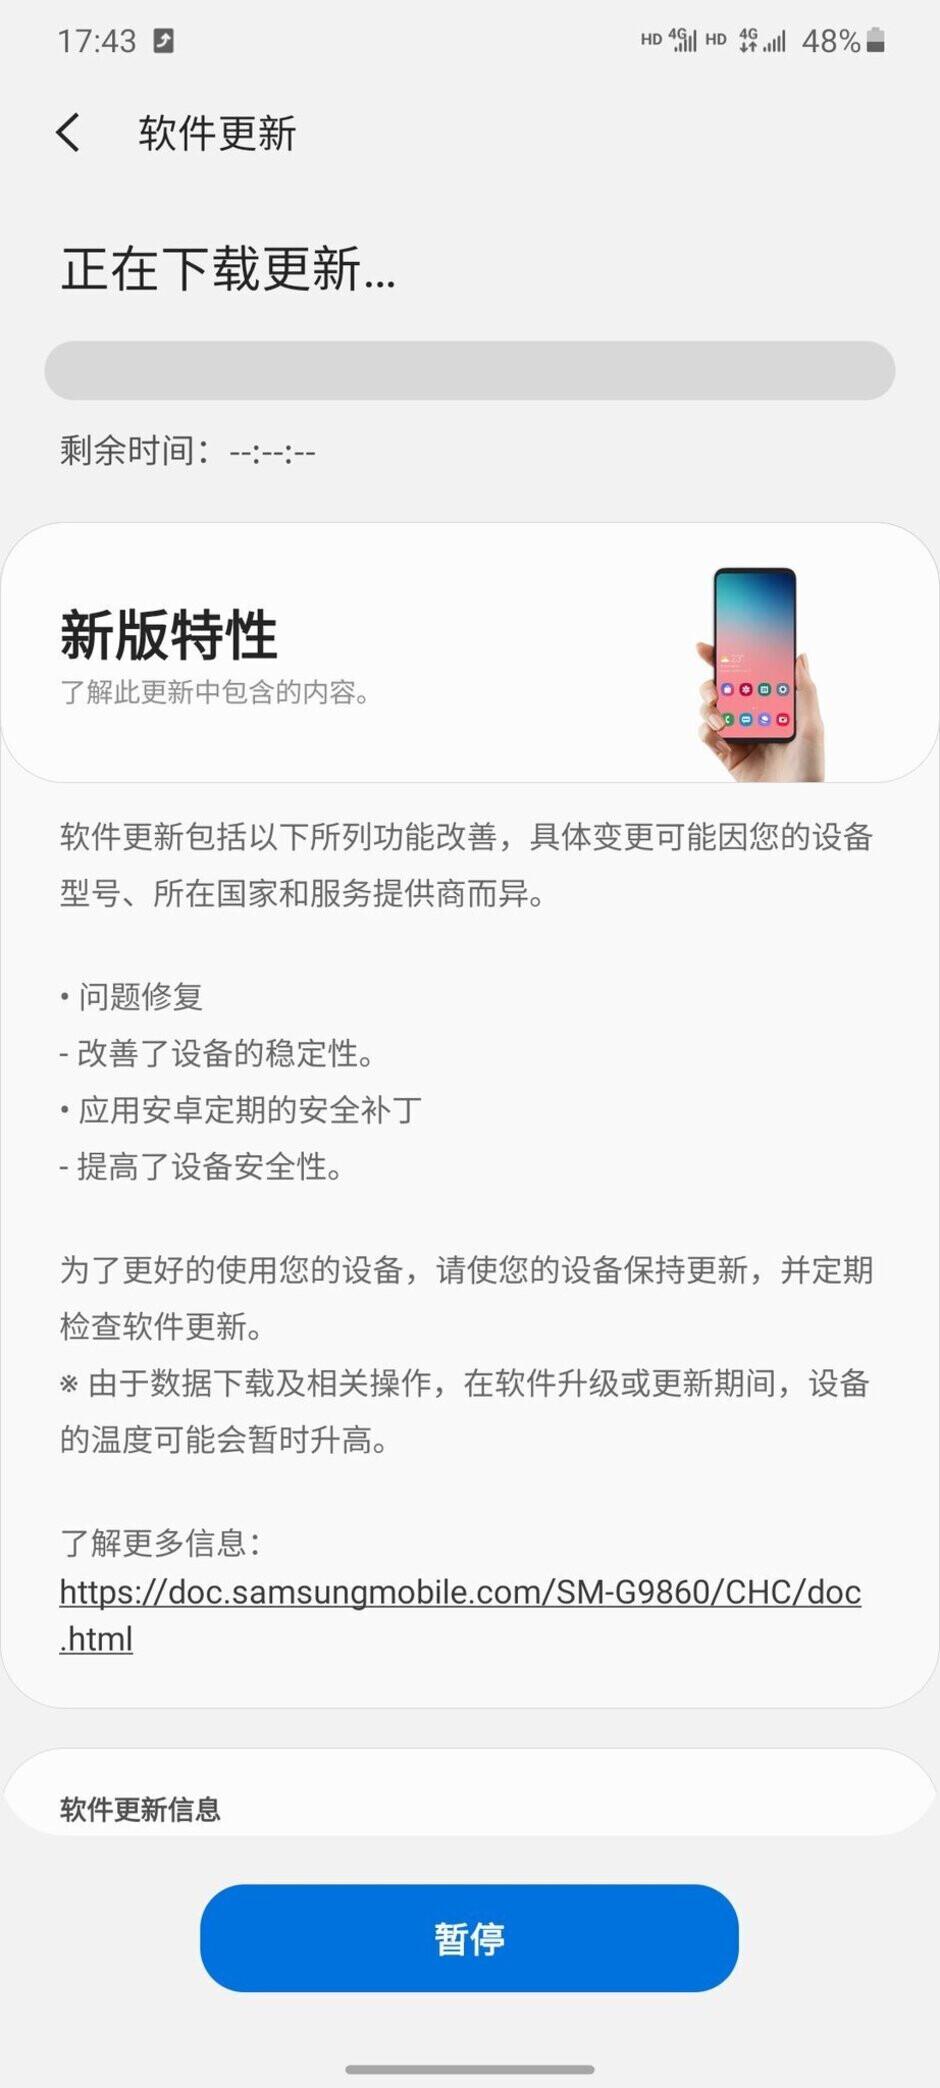 Samsung Galaxy S20 series update brings more camera improvements